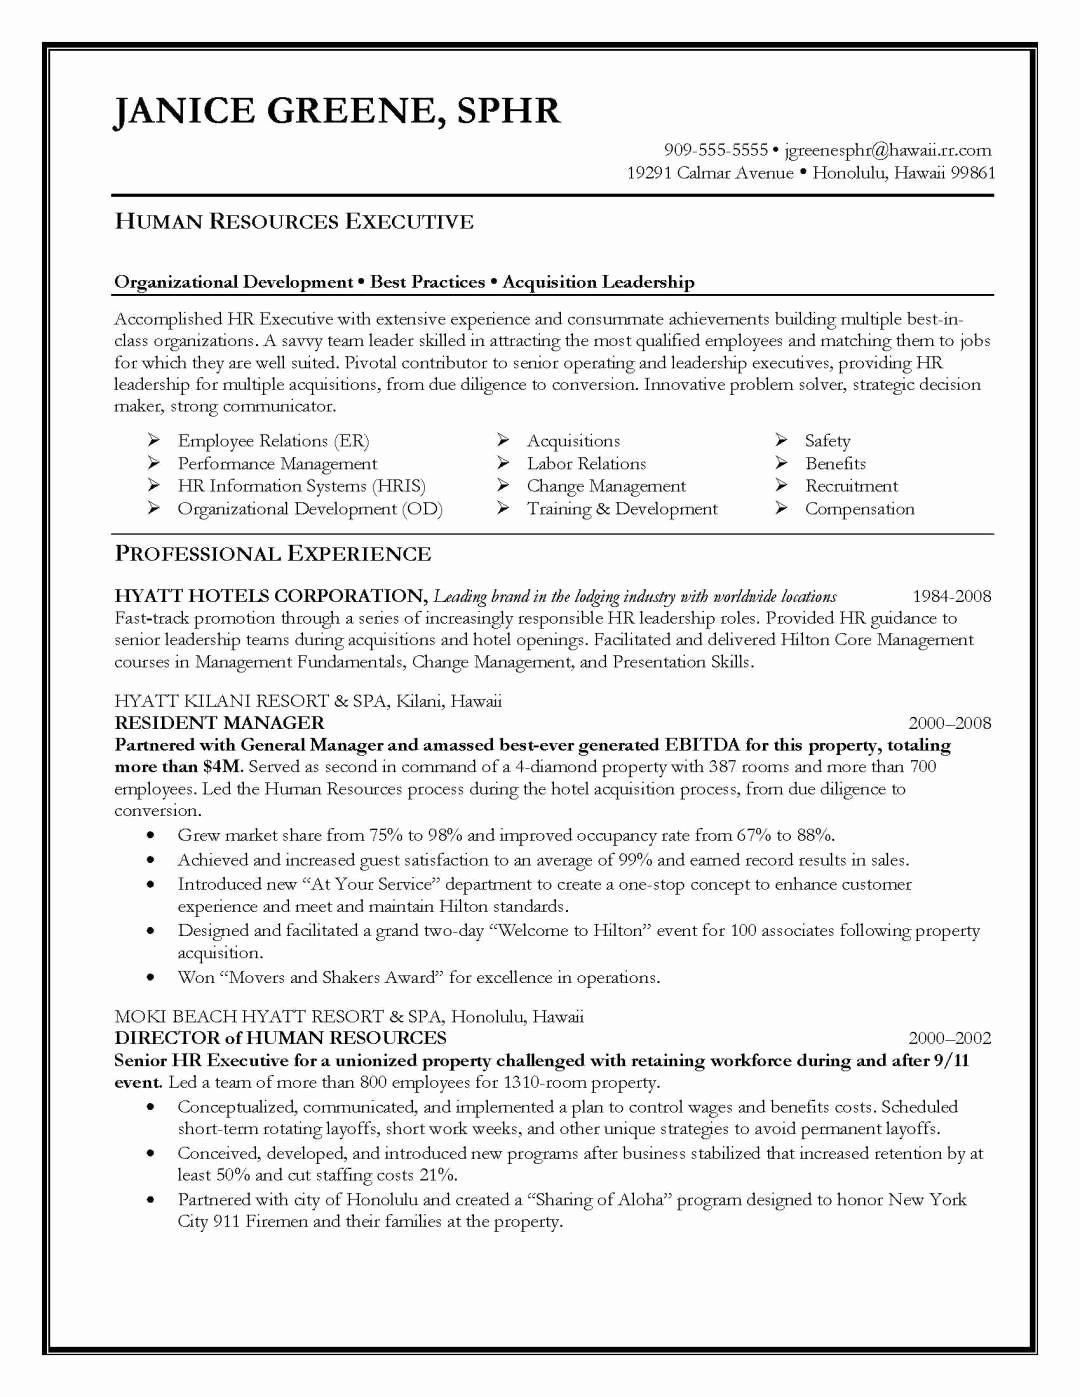 Human Resource Resume Template Awesome Resume Samples Elite Resume Writing